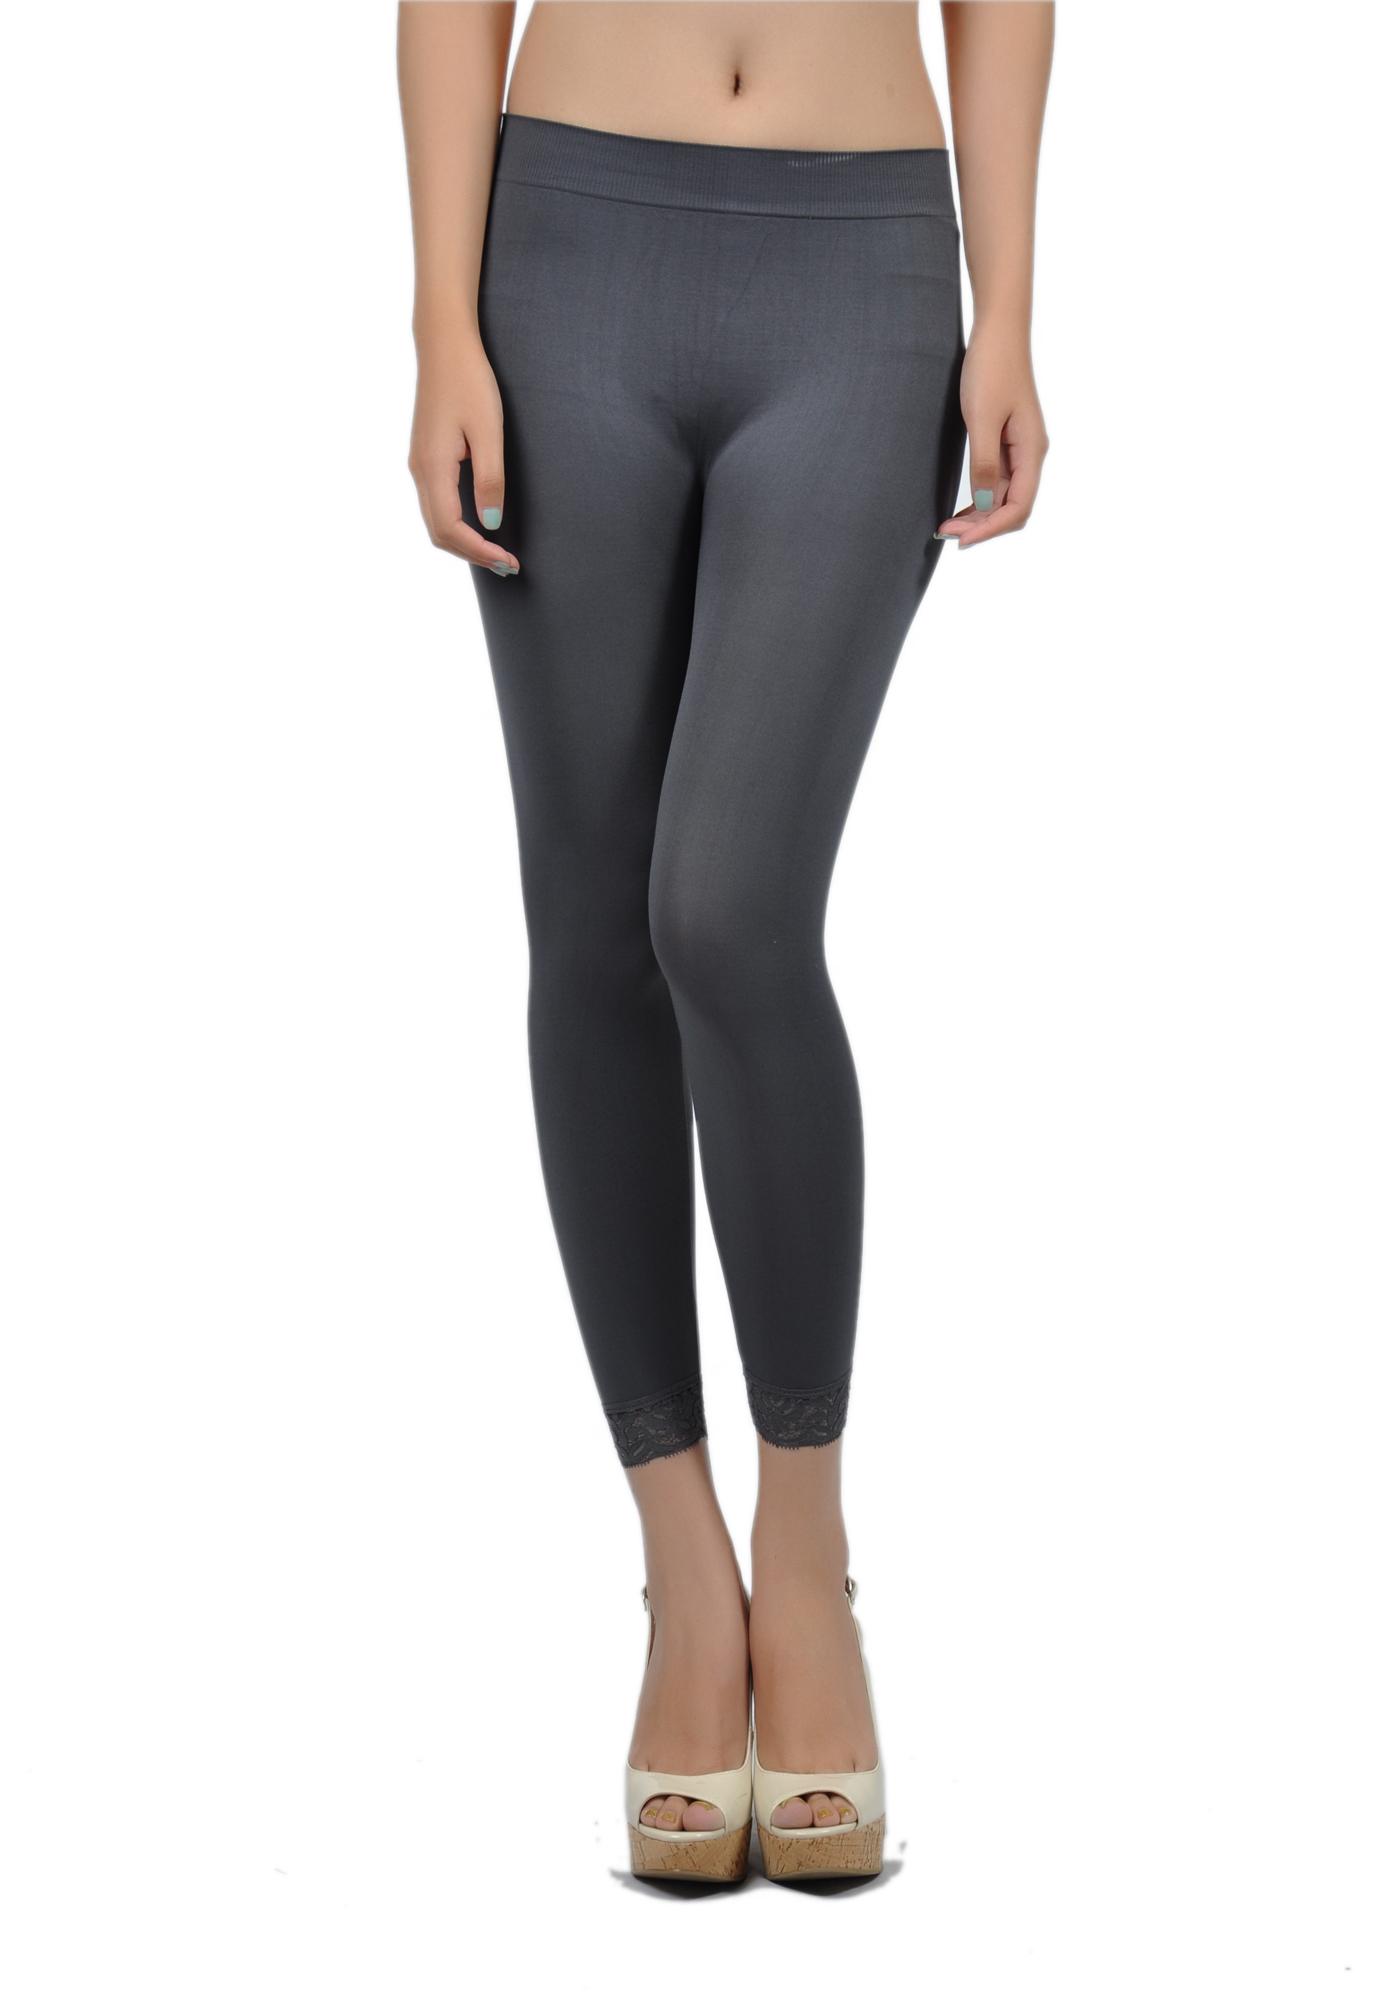 Soho Girls Junior's Capri Length Lace Trim Leggings - One Size, Charcoal at Sears.com